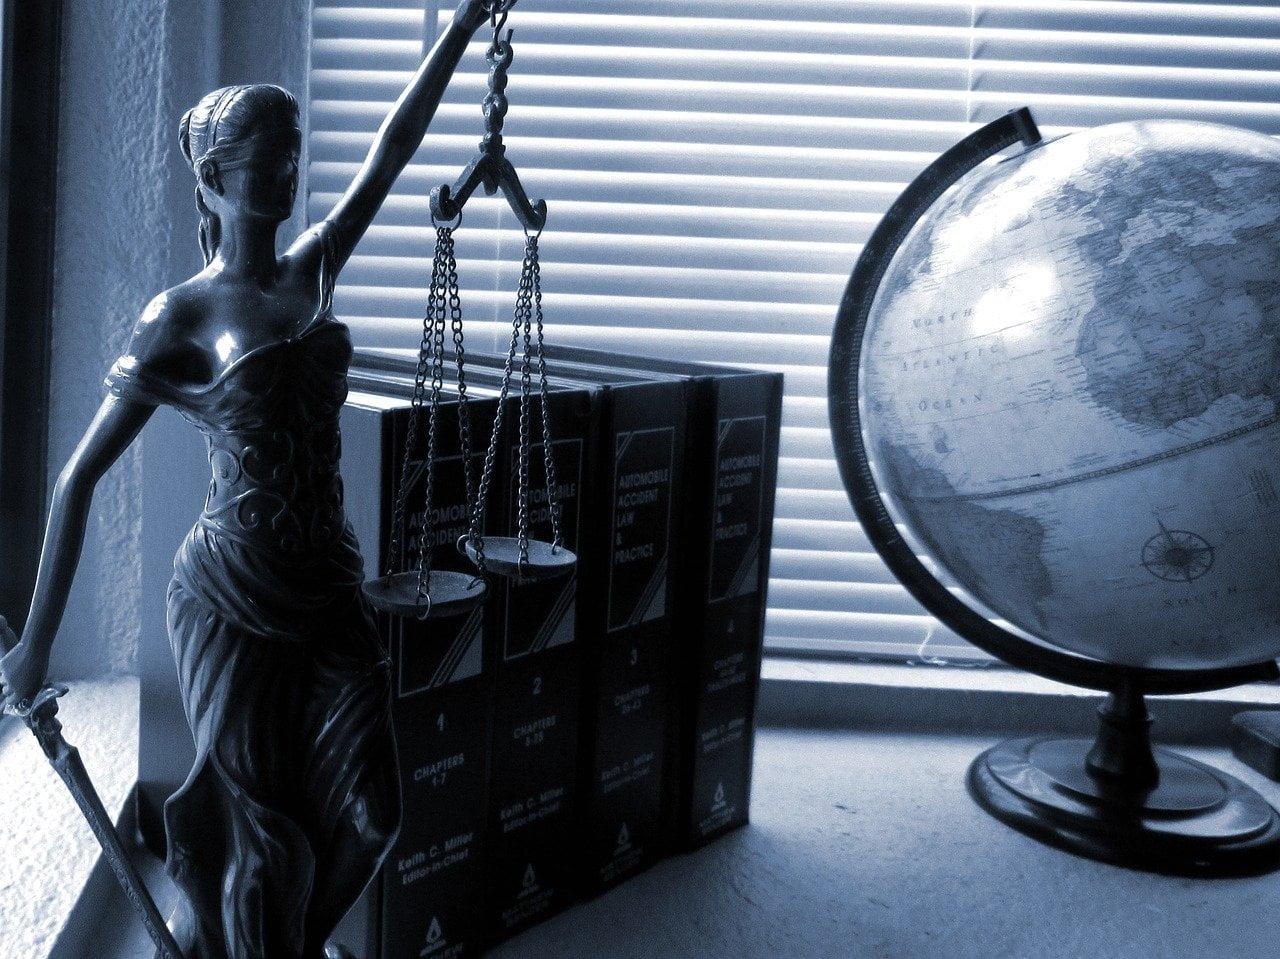 קידום עורכי דין באינטרנט